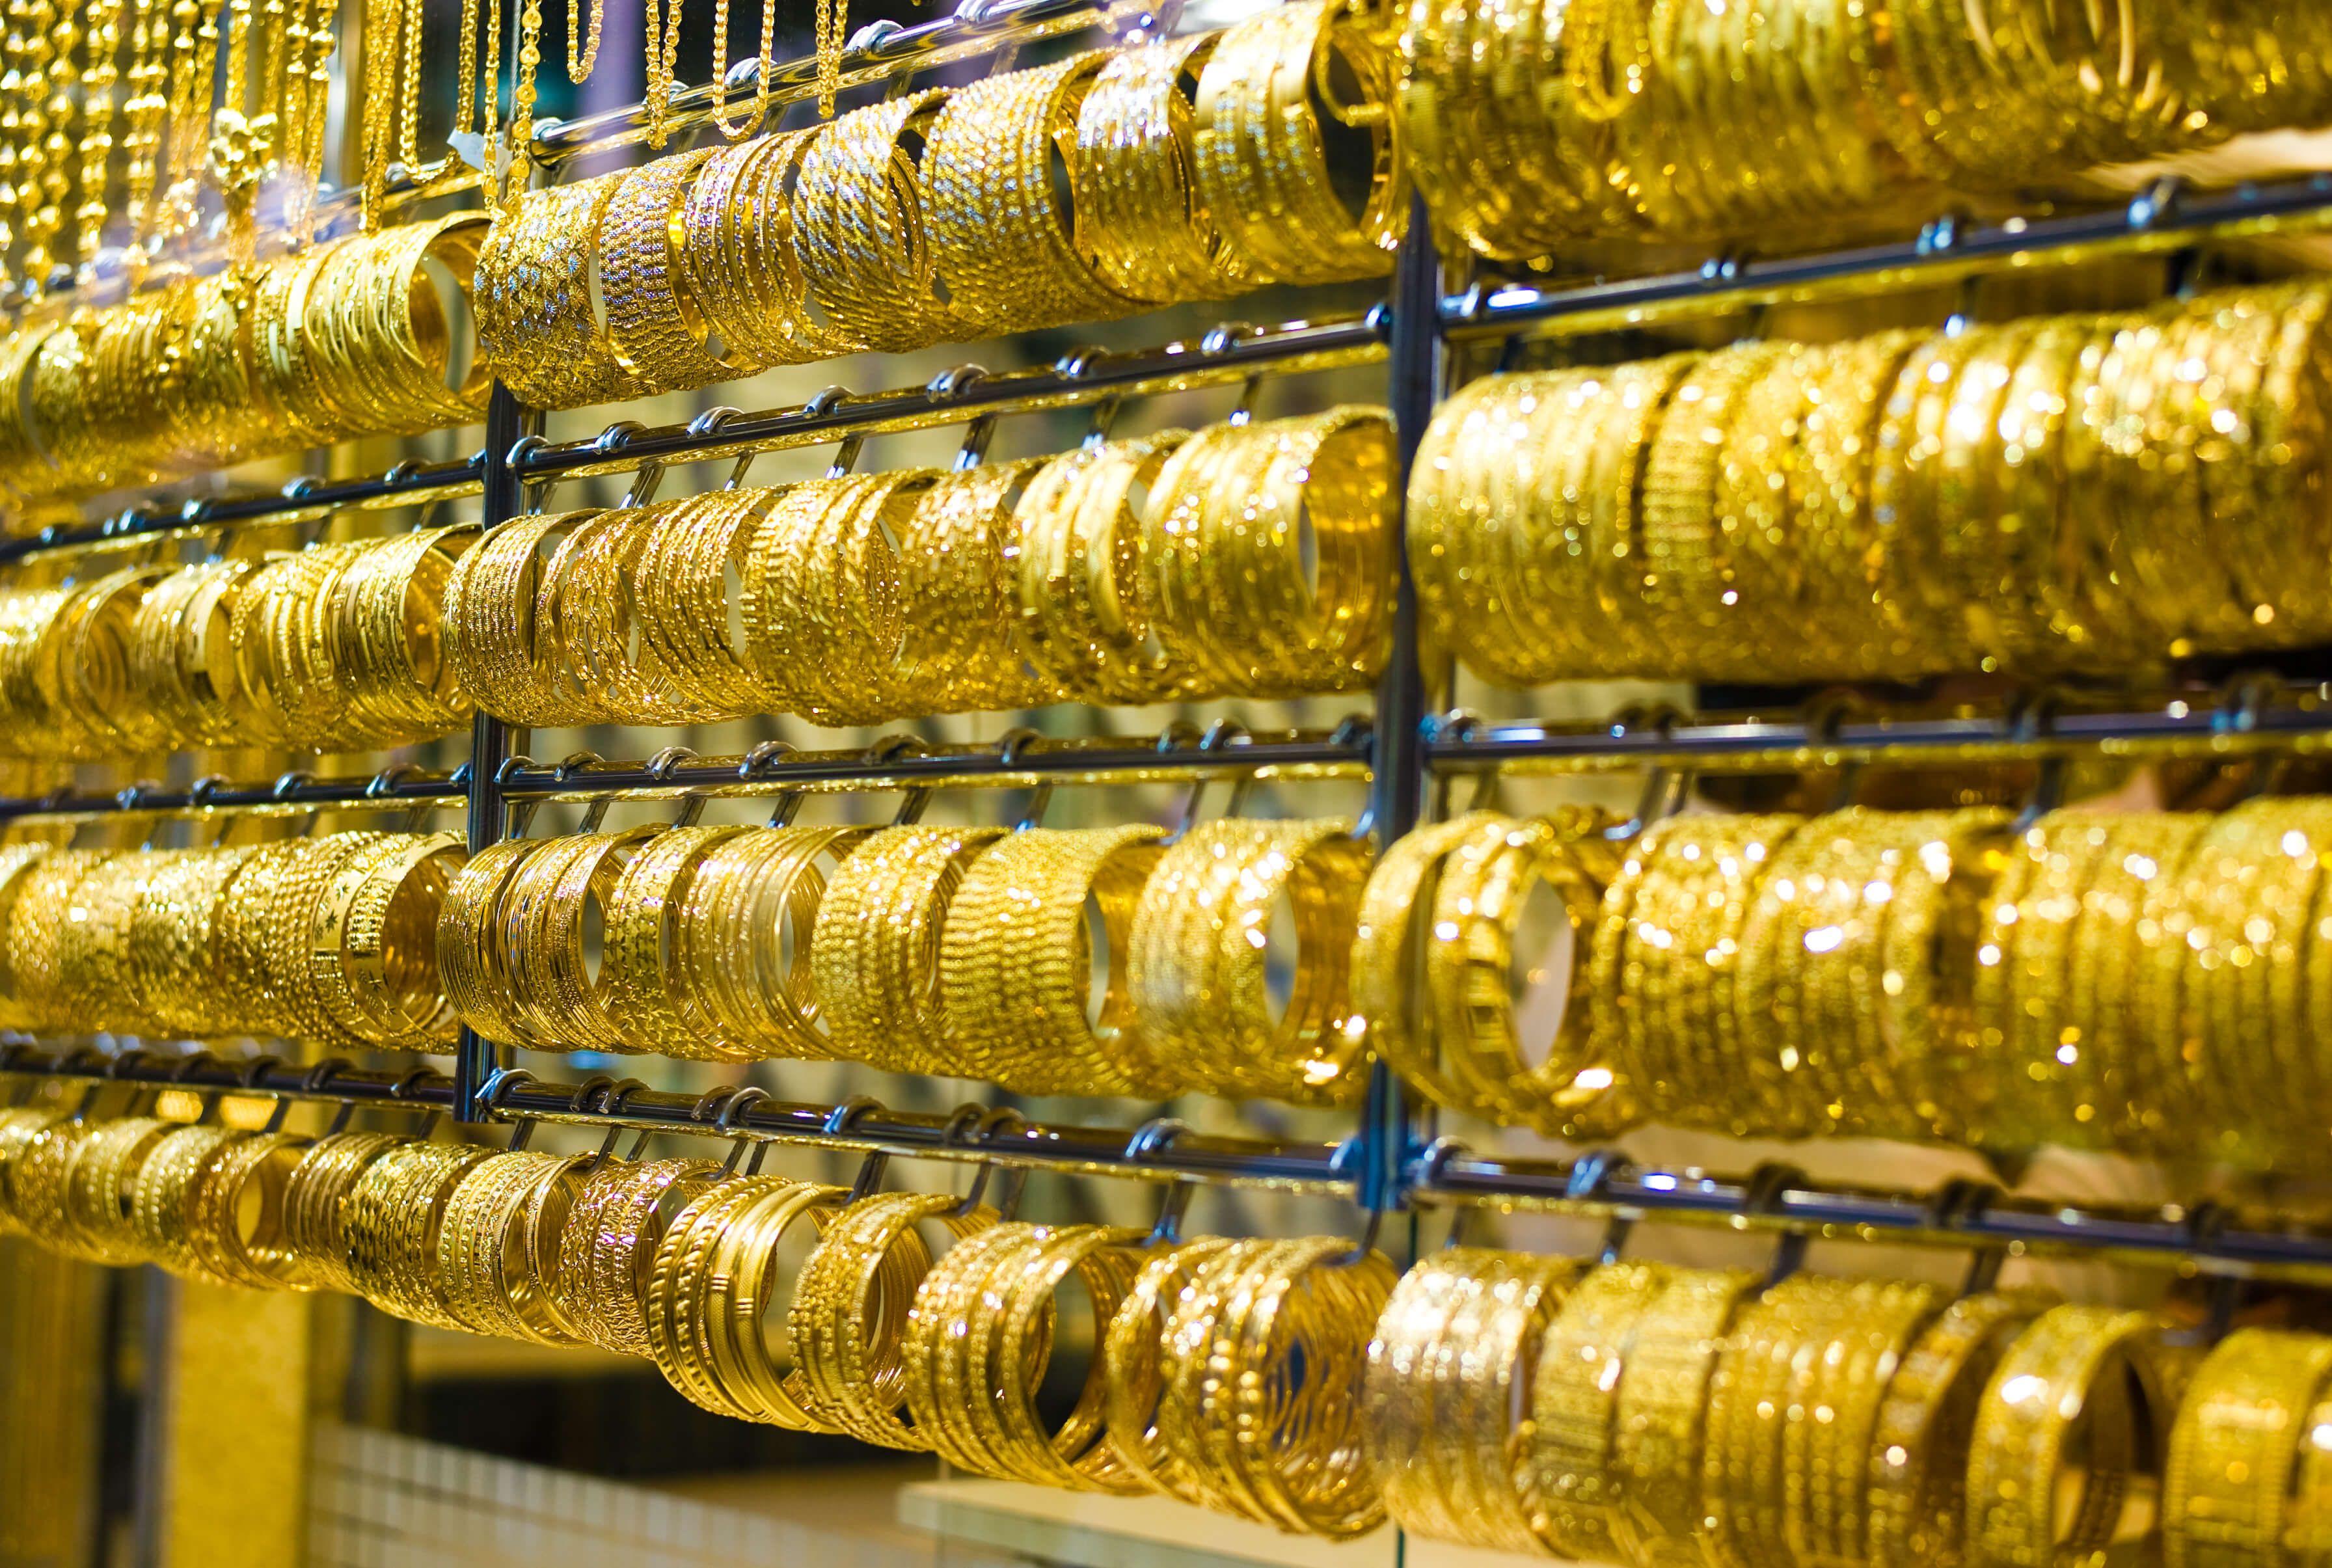 سعر الذهب اليوم في قطر Gold Souk Dubai Gold Jewelry Souks In Dubai